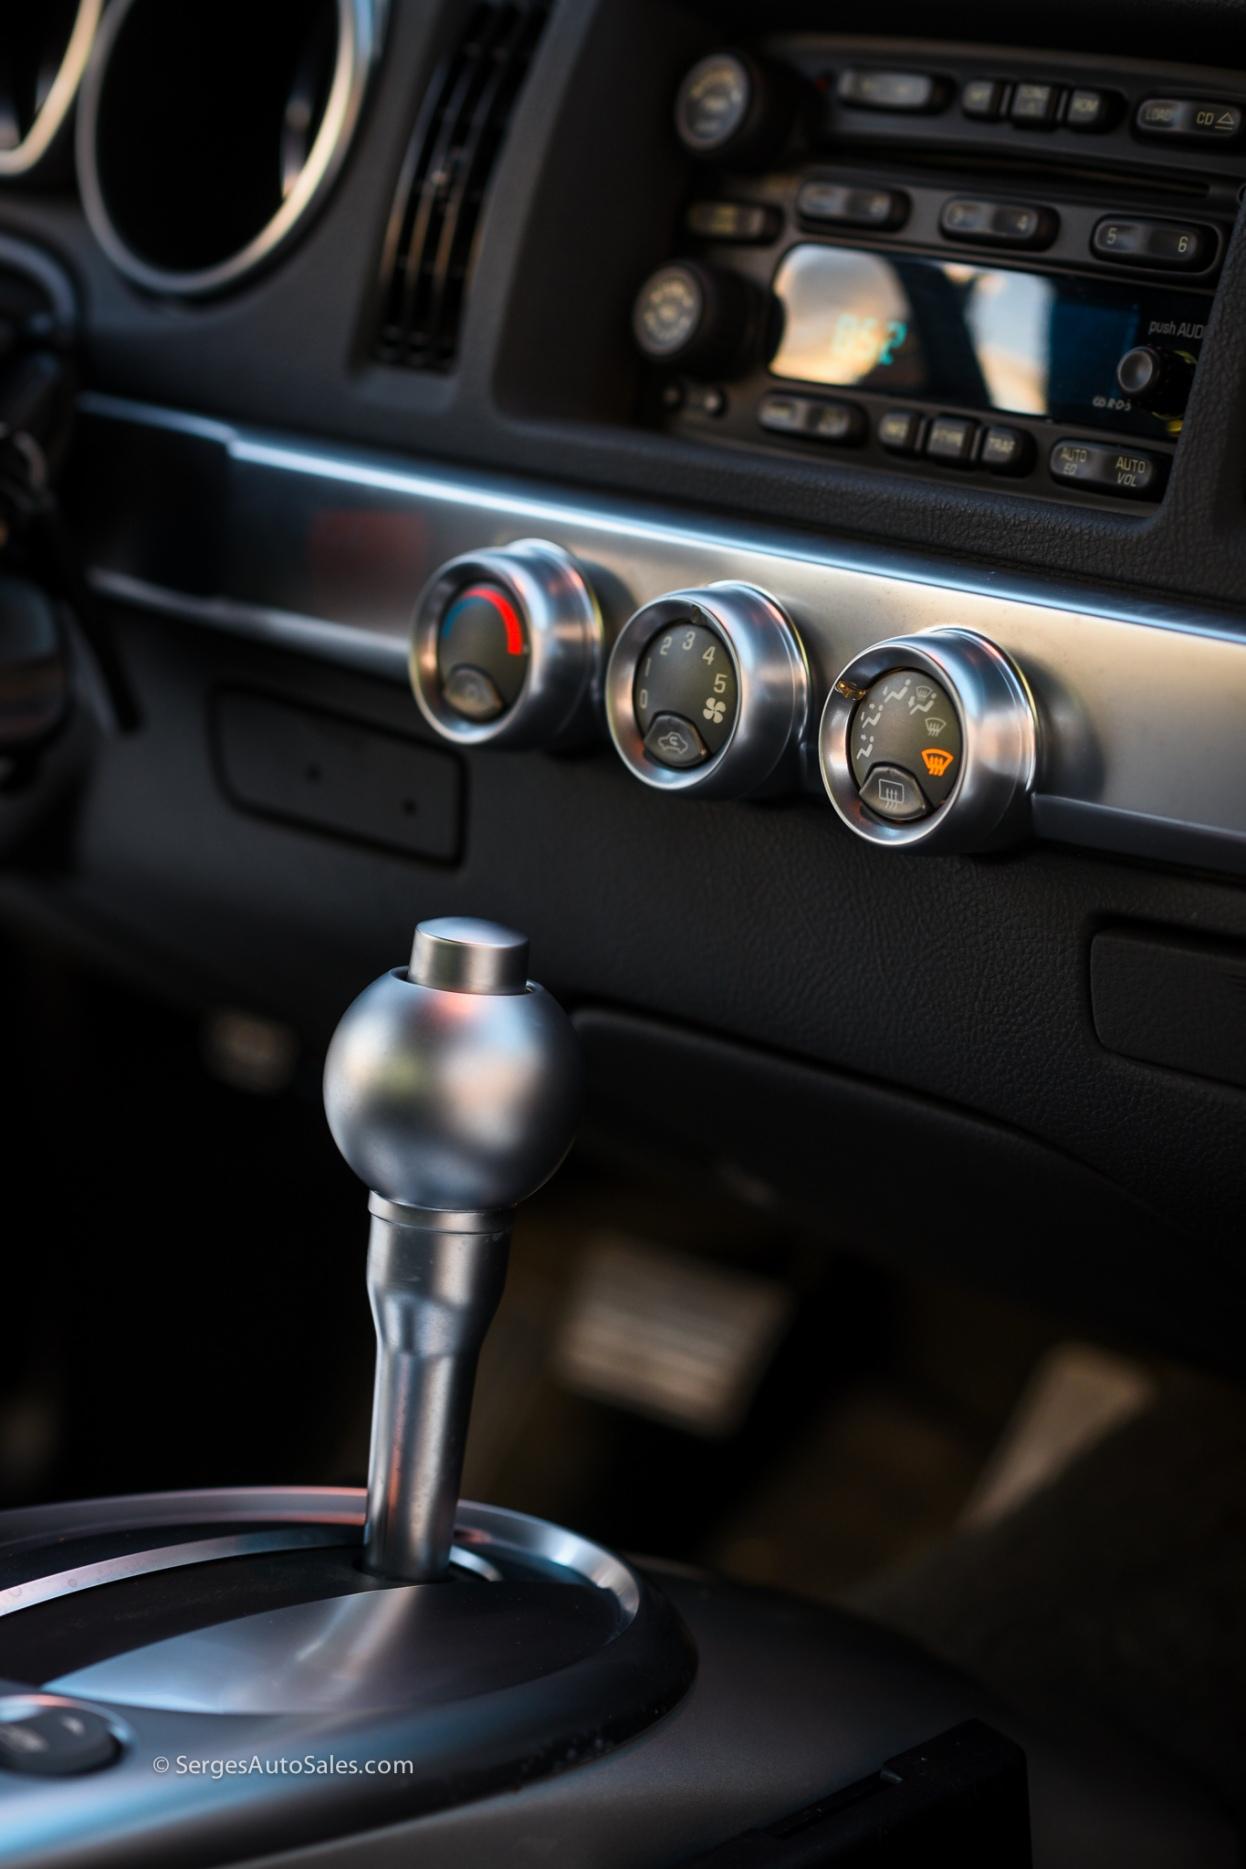 SSR-For-sale-serges-auto-sales-northeast-pa-car-dealer-specialty-corvettes-muscle-classics-40